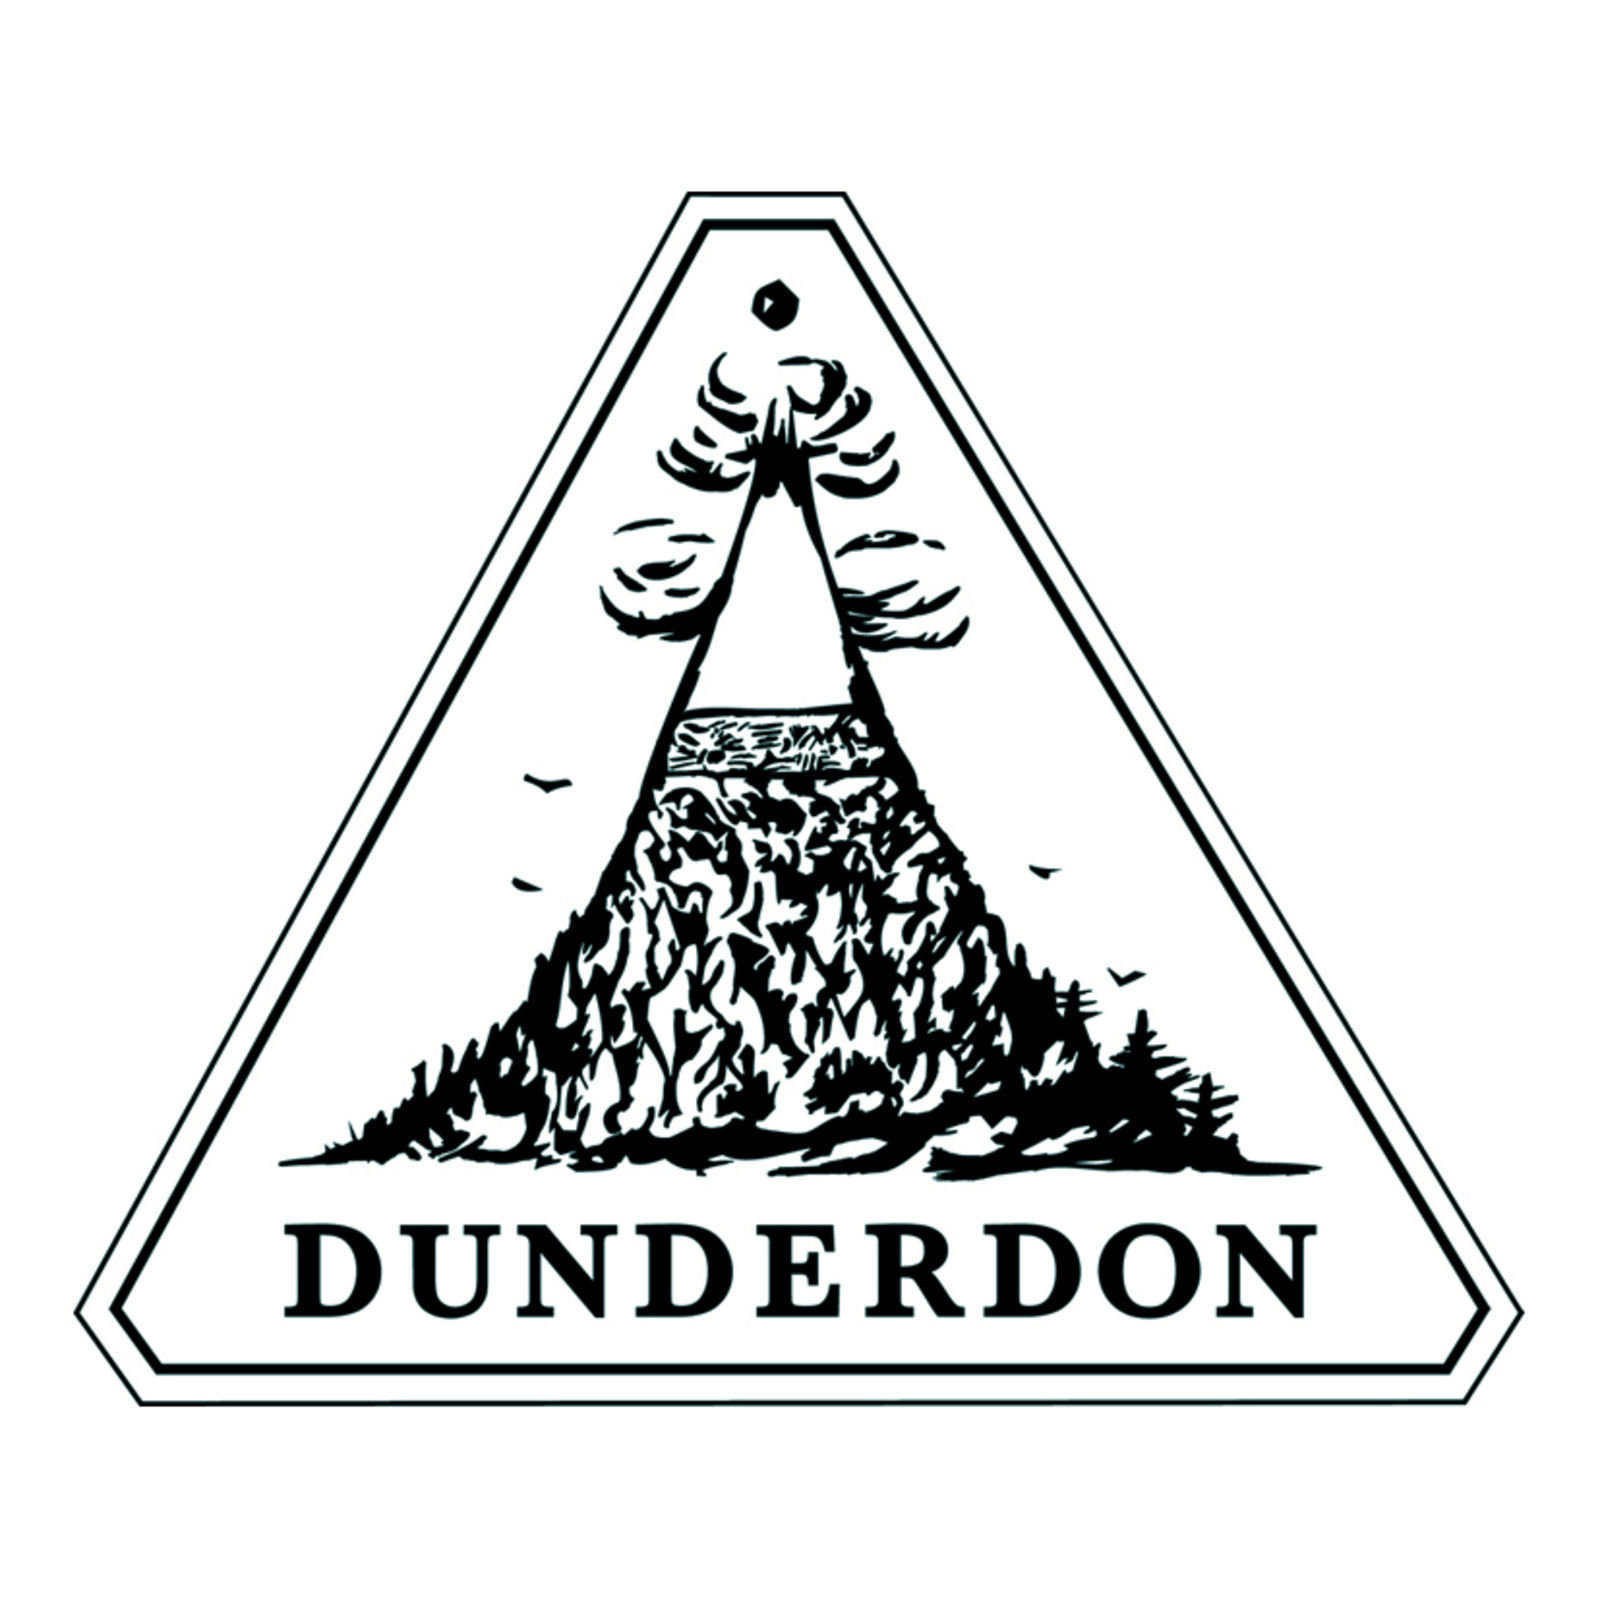 DUNDERDON